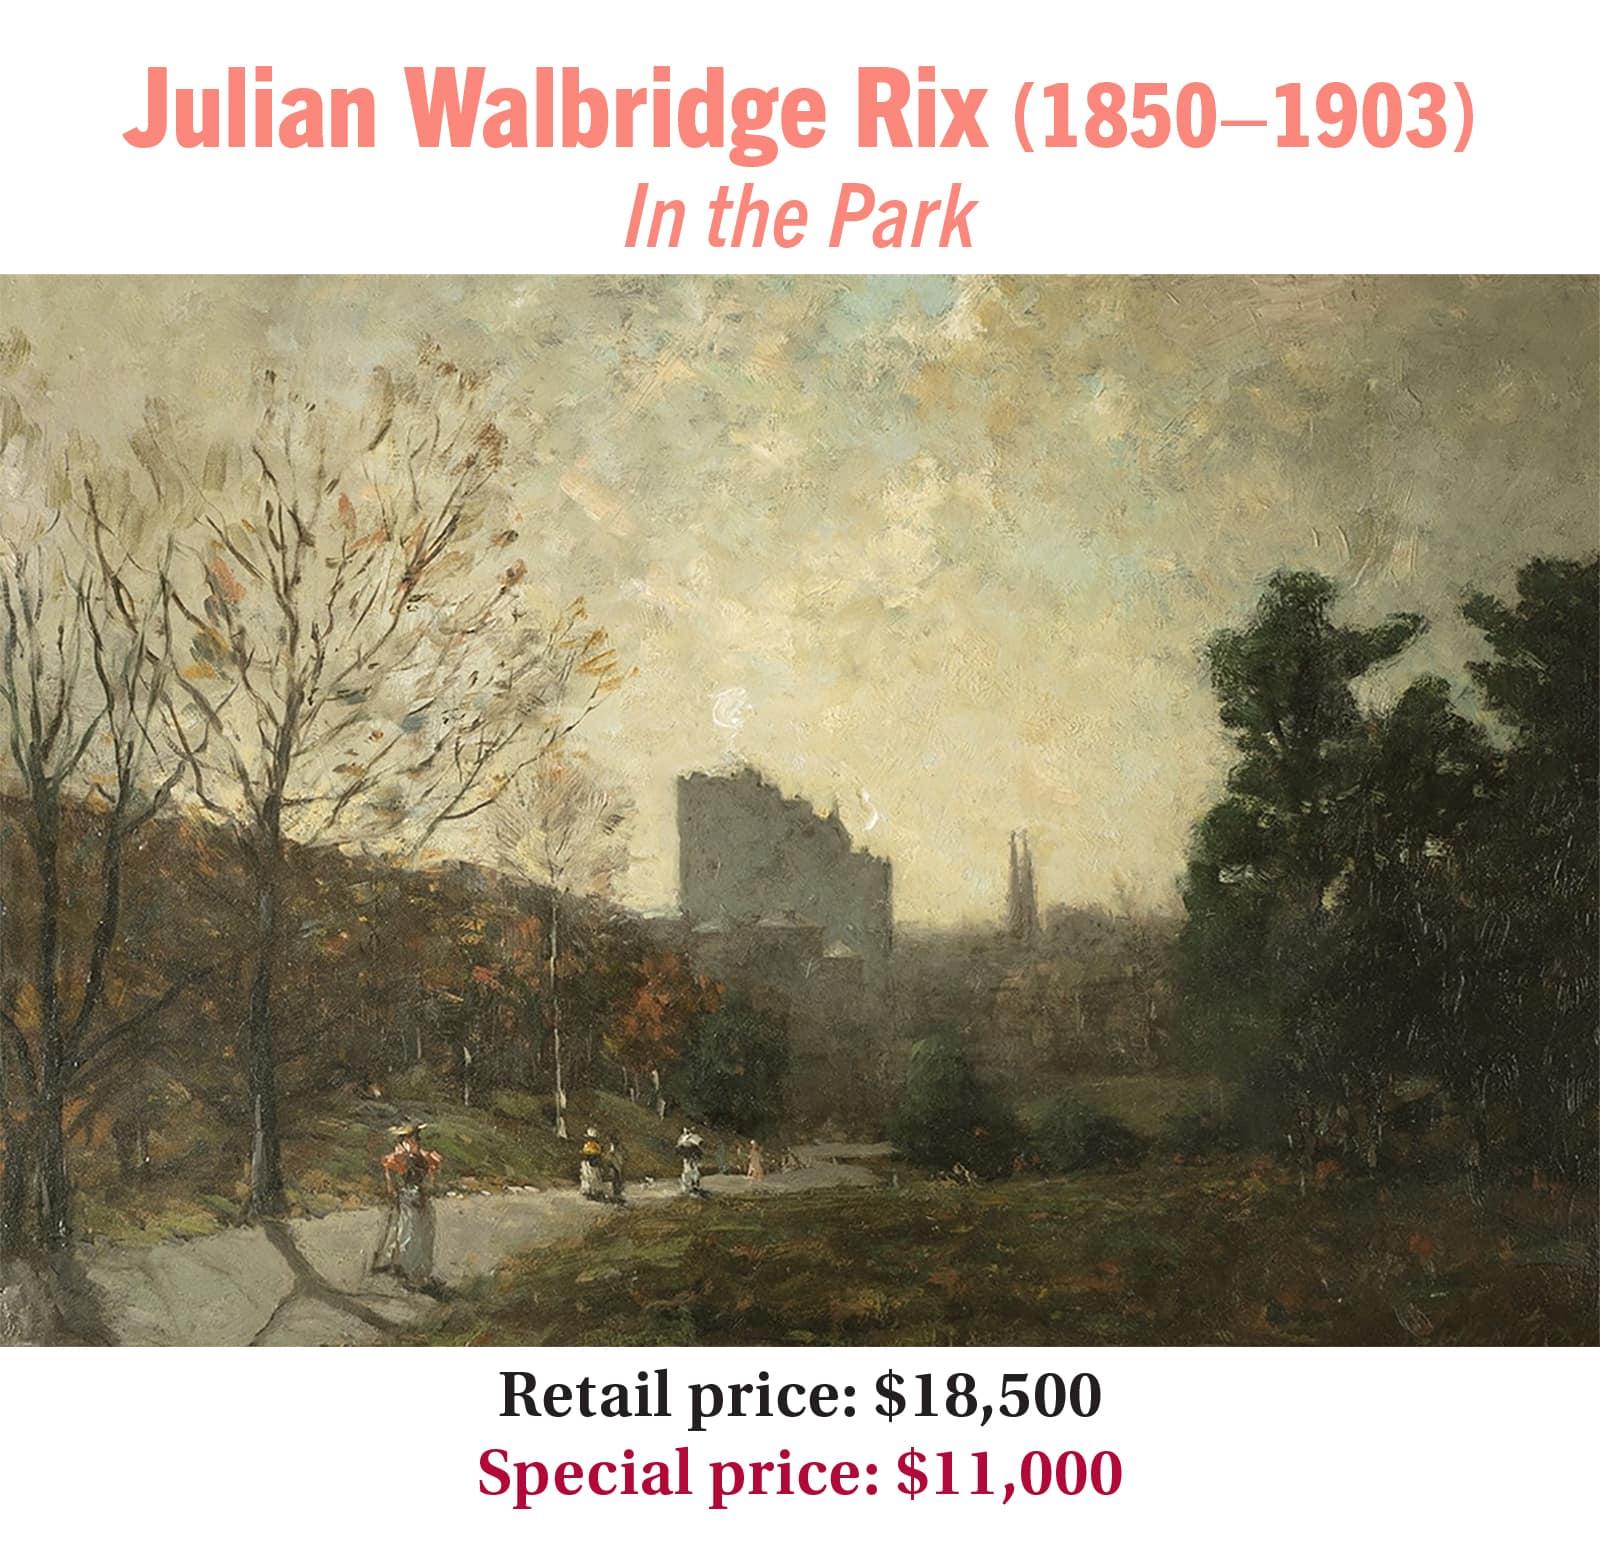 Julian Walbridge Rix (1850–1903), In the Park, oil on panel, American impressionist landscape painting